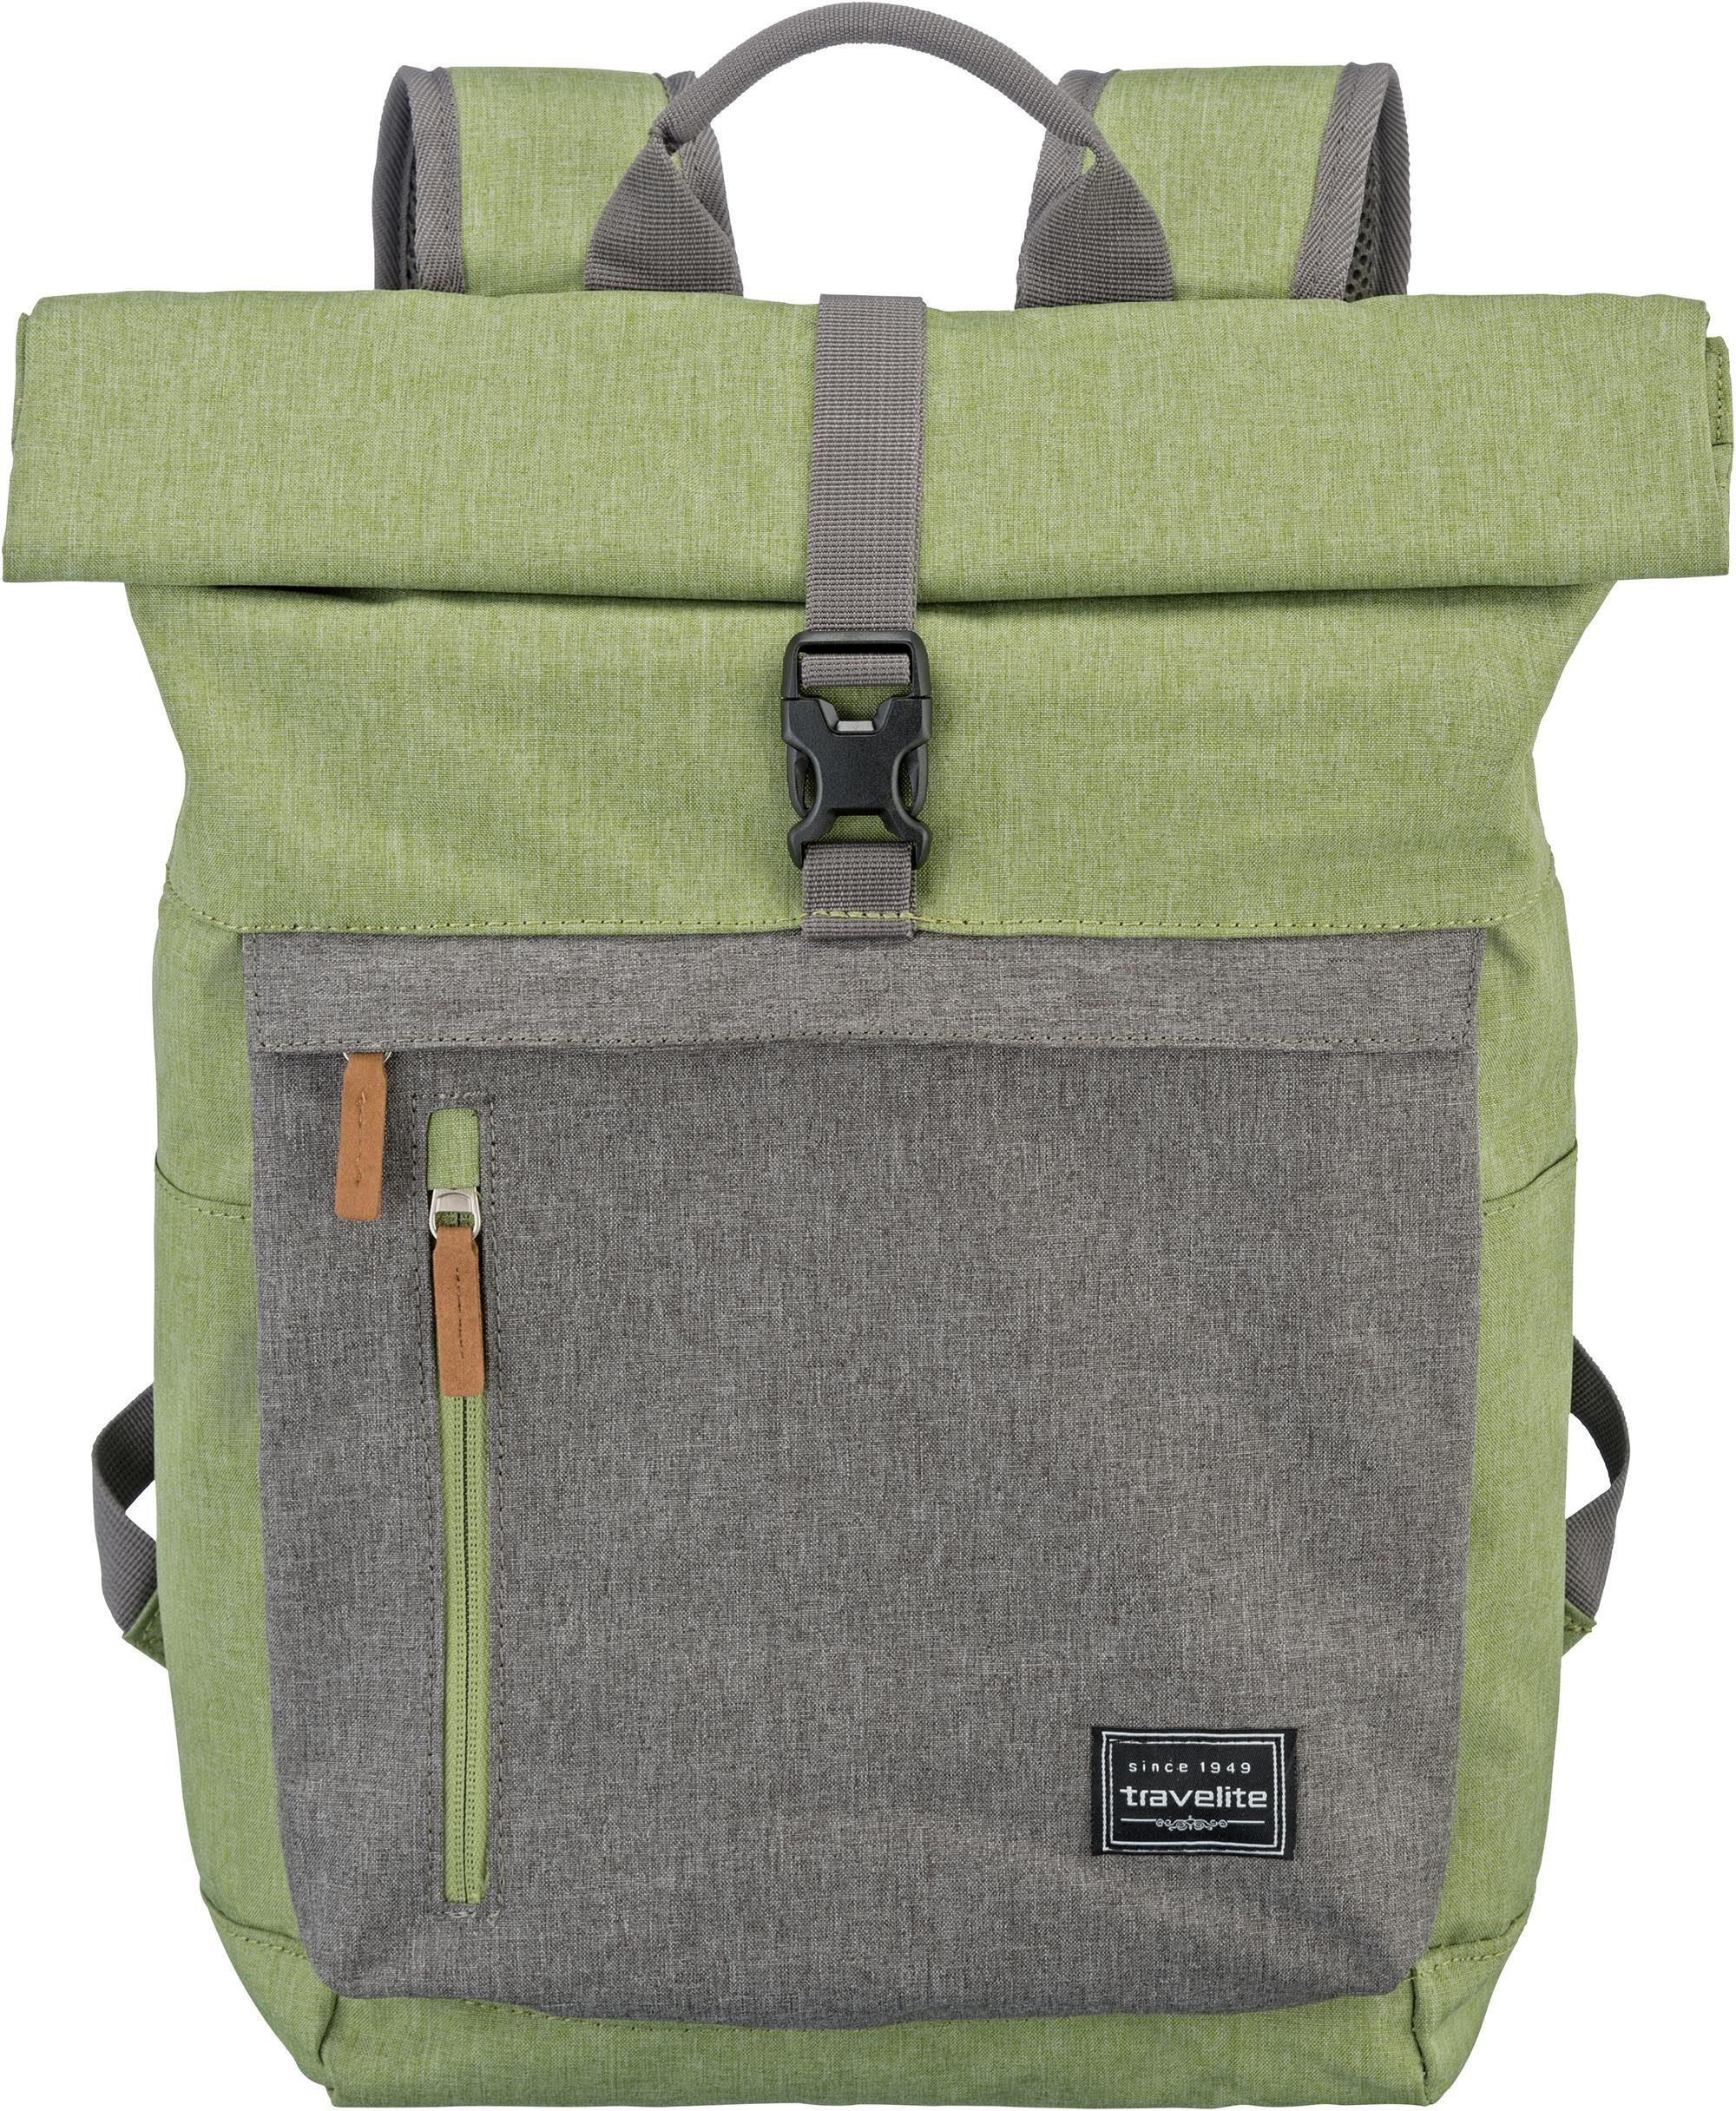 travelite Rucksack mit 15,6 Zoll Laptopfach, »Basics Rollup, Grün/Grau«